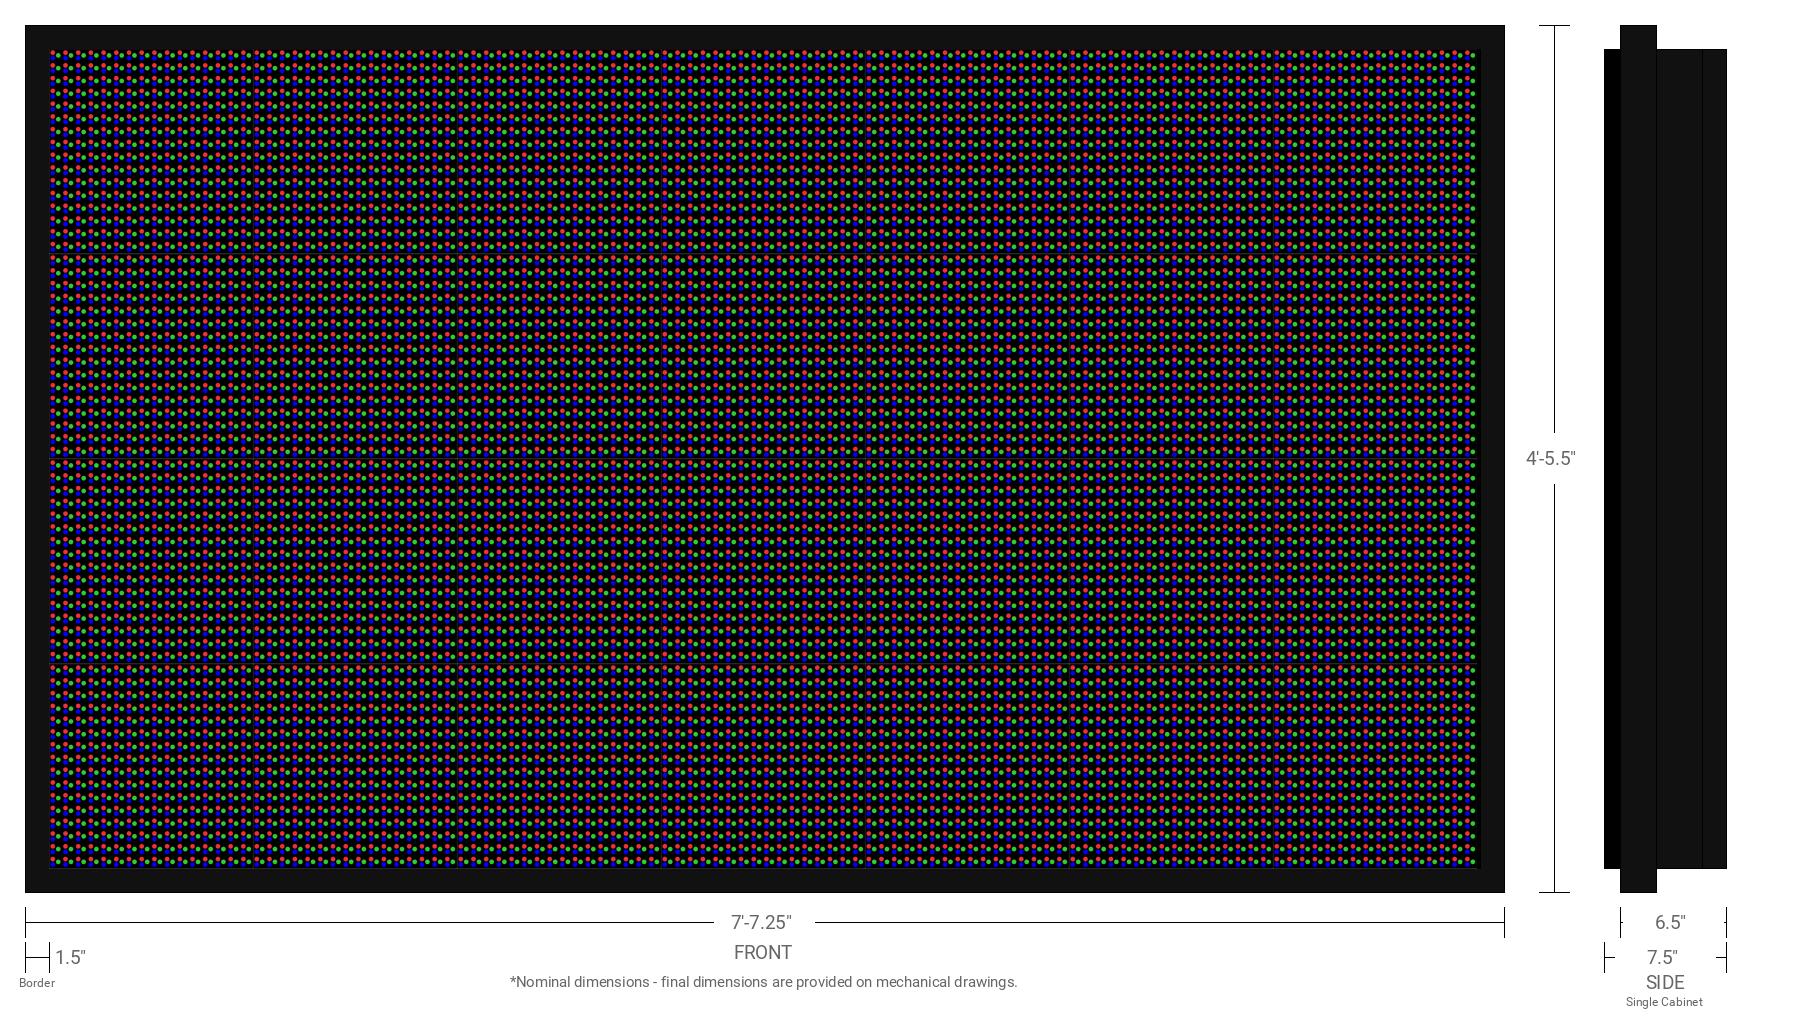 Aurora 20mm 64x112 Single Sided Full Color LED Display